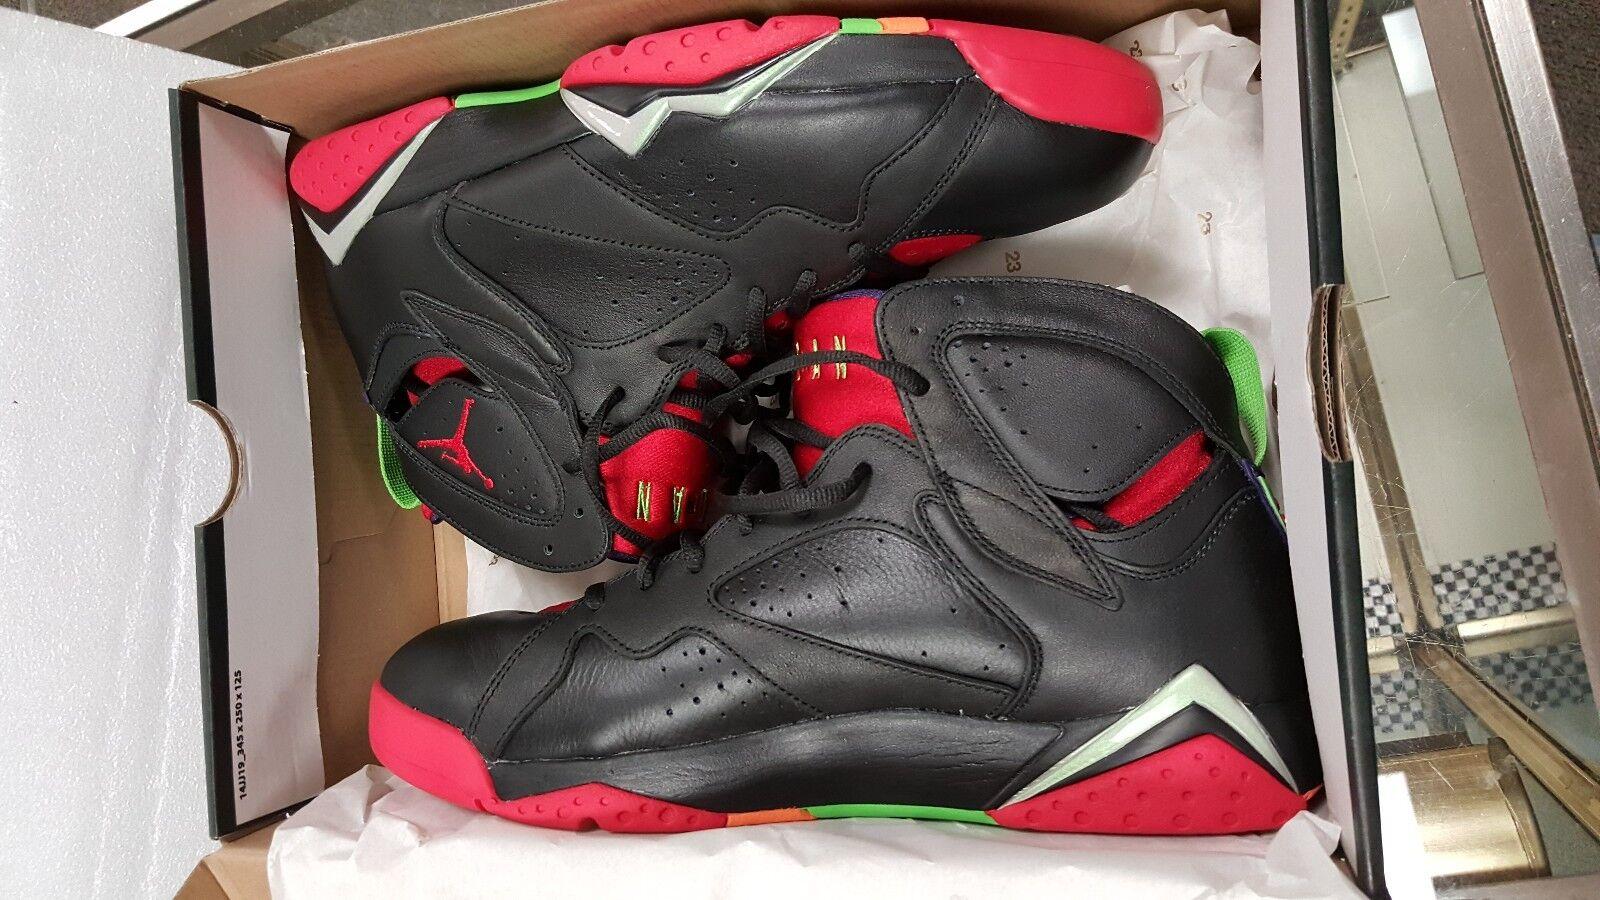 Brand New Jordan retro 7 Size 11